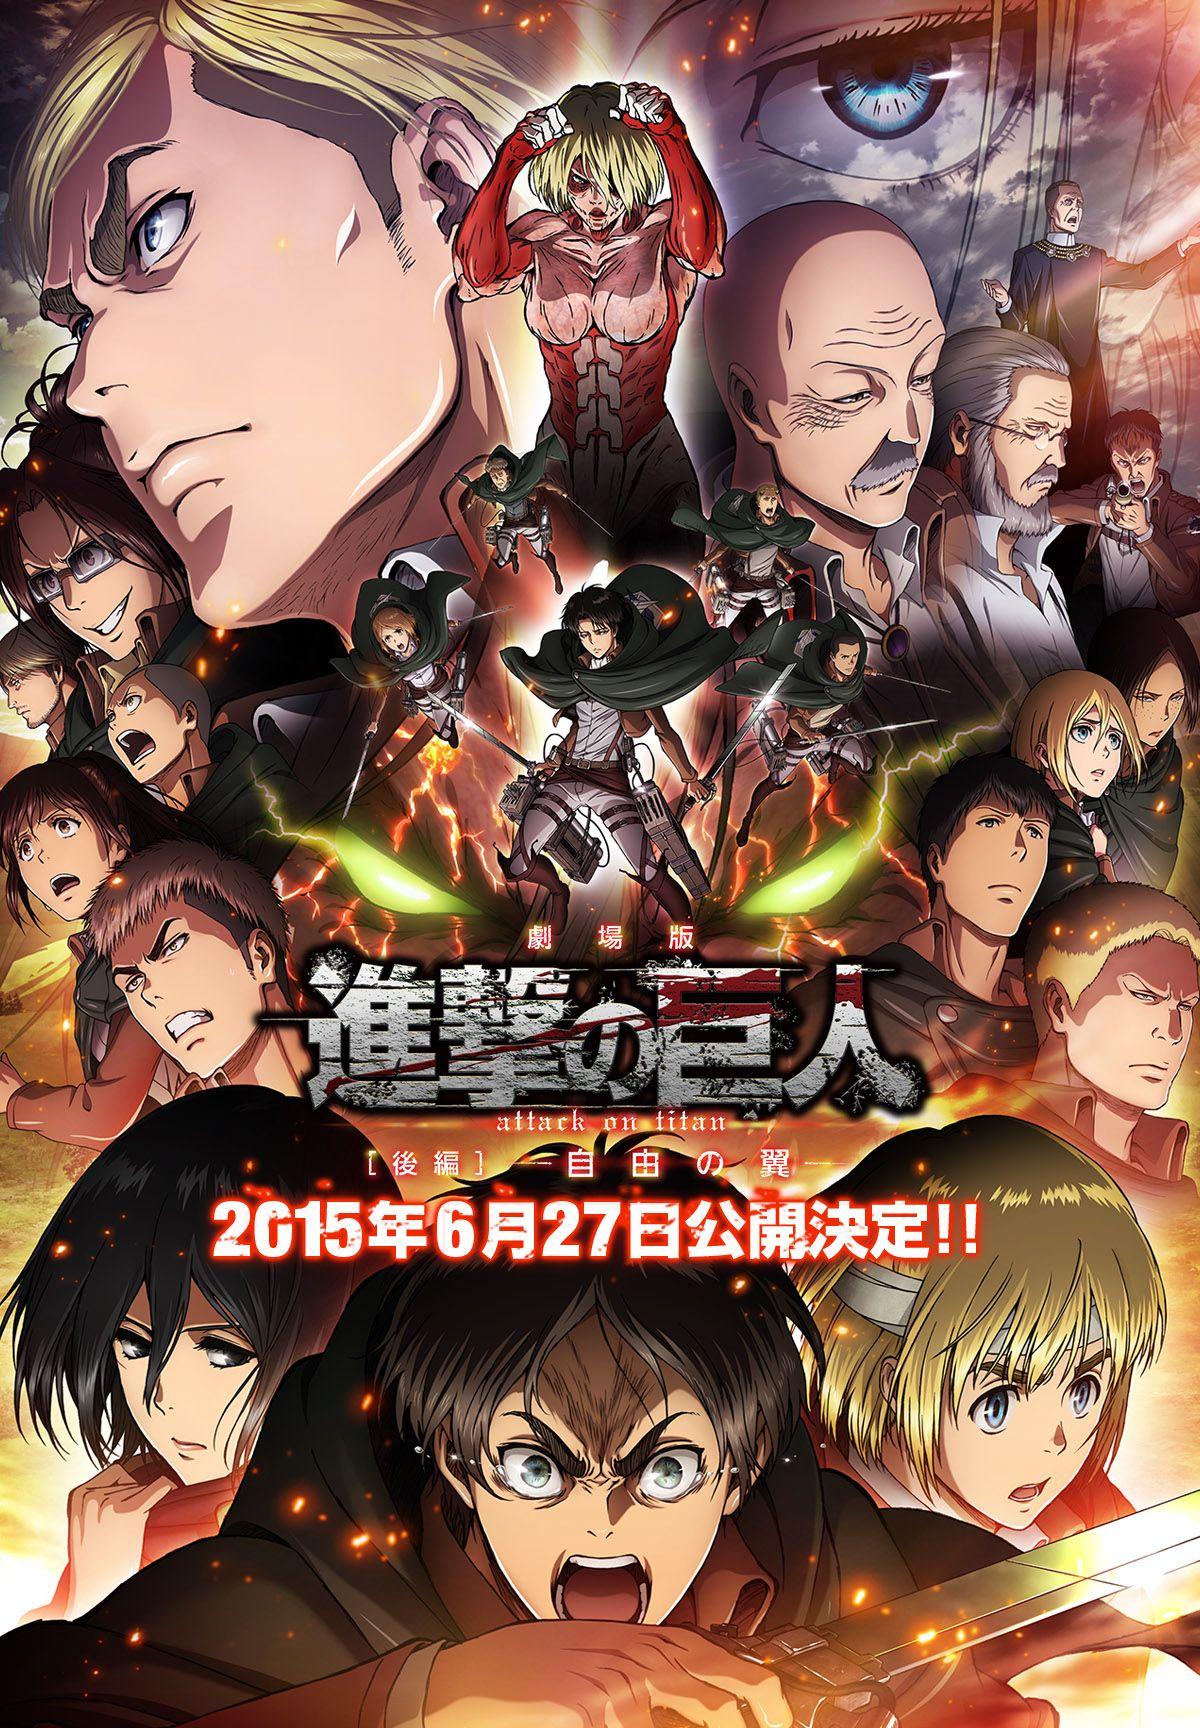 Pin By Kureiji Steff On Attack On Titan Snk Attack On Titan Anime Anime Attack On Titan